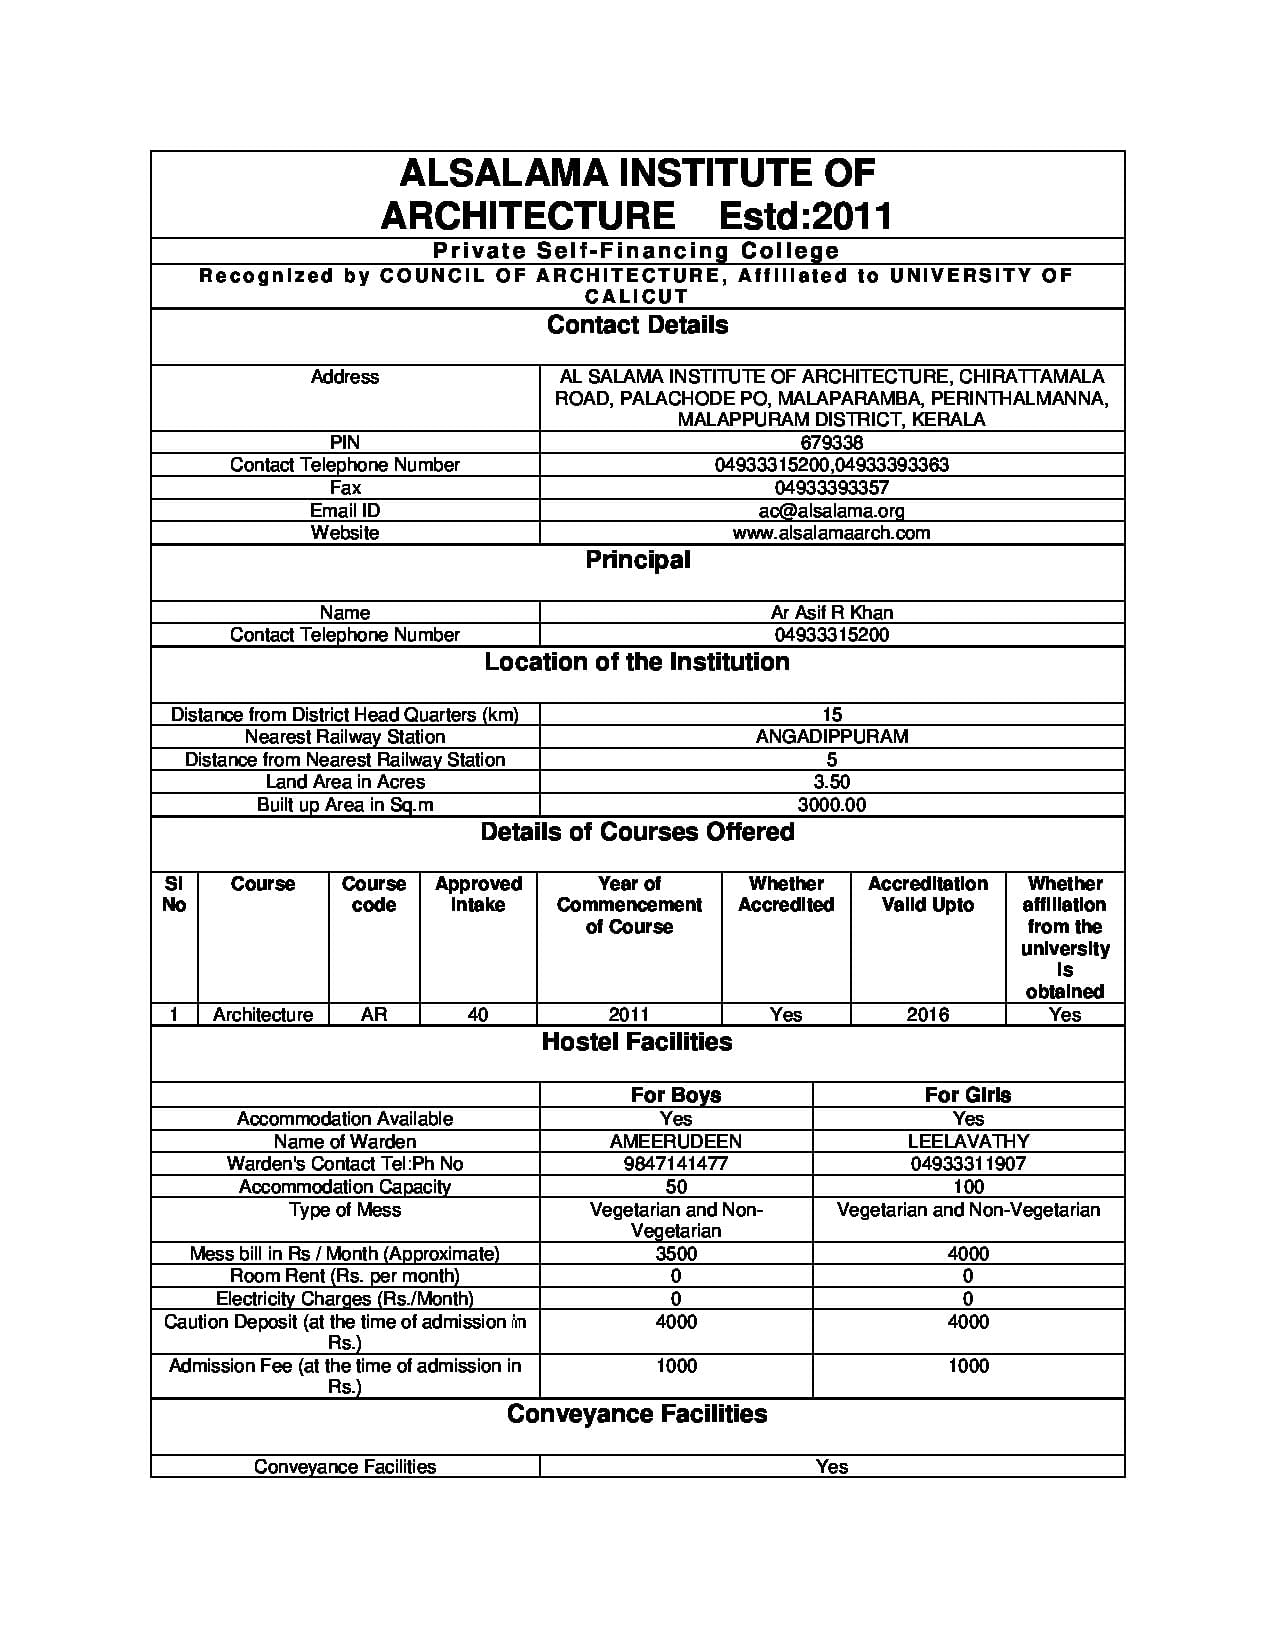 Miraculous Al Salama Institute Of Architecture Asia Perinthalmanna Download Free Architecture Designs Scobabritishbridgeorg